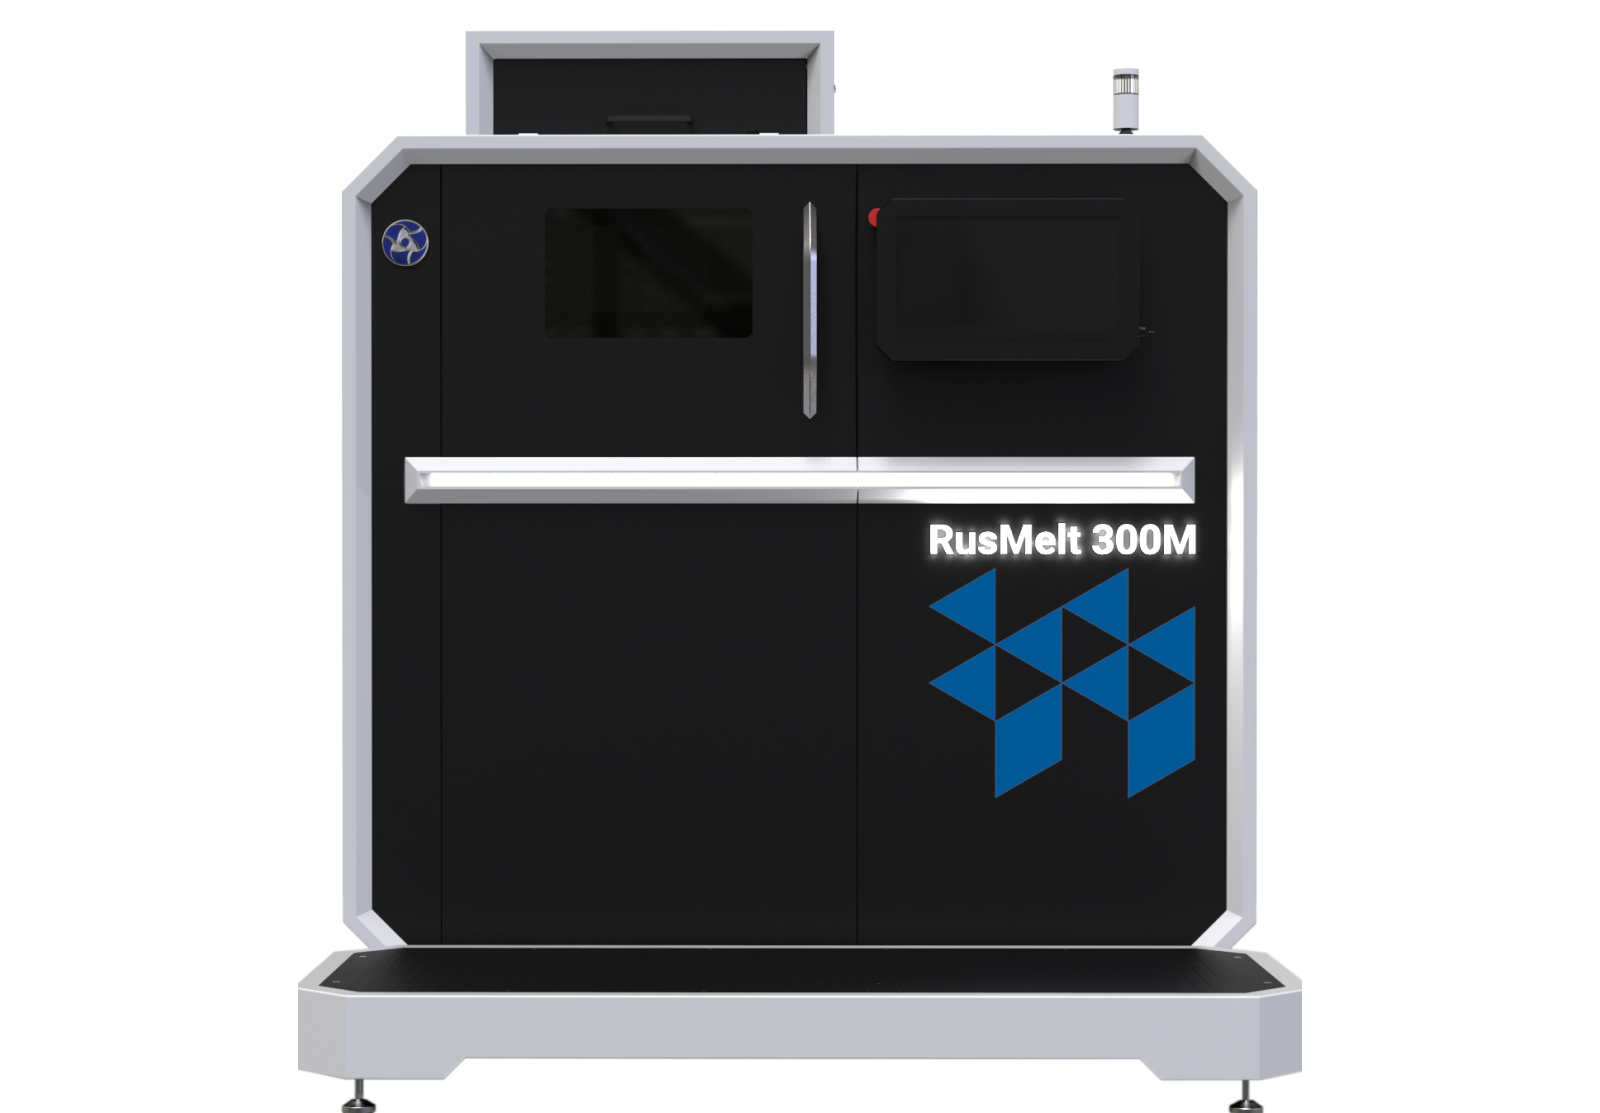 Rusatom manufactures LB-PBF printers such as this RusMelt 300M. Photo via Rosatom.